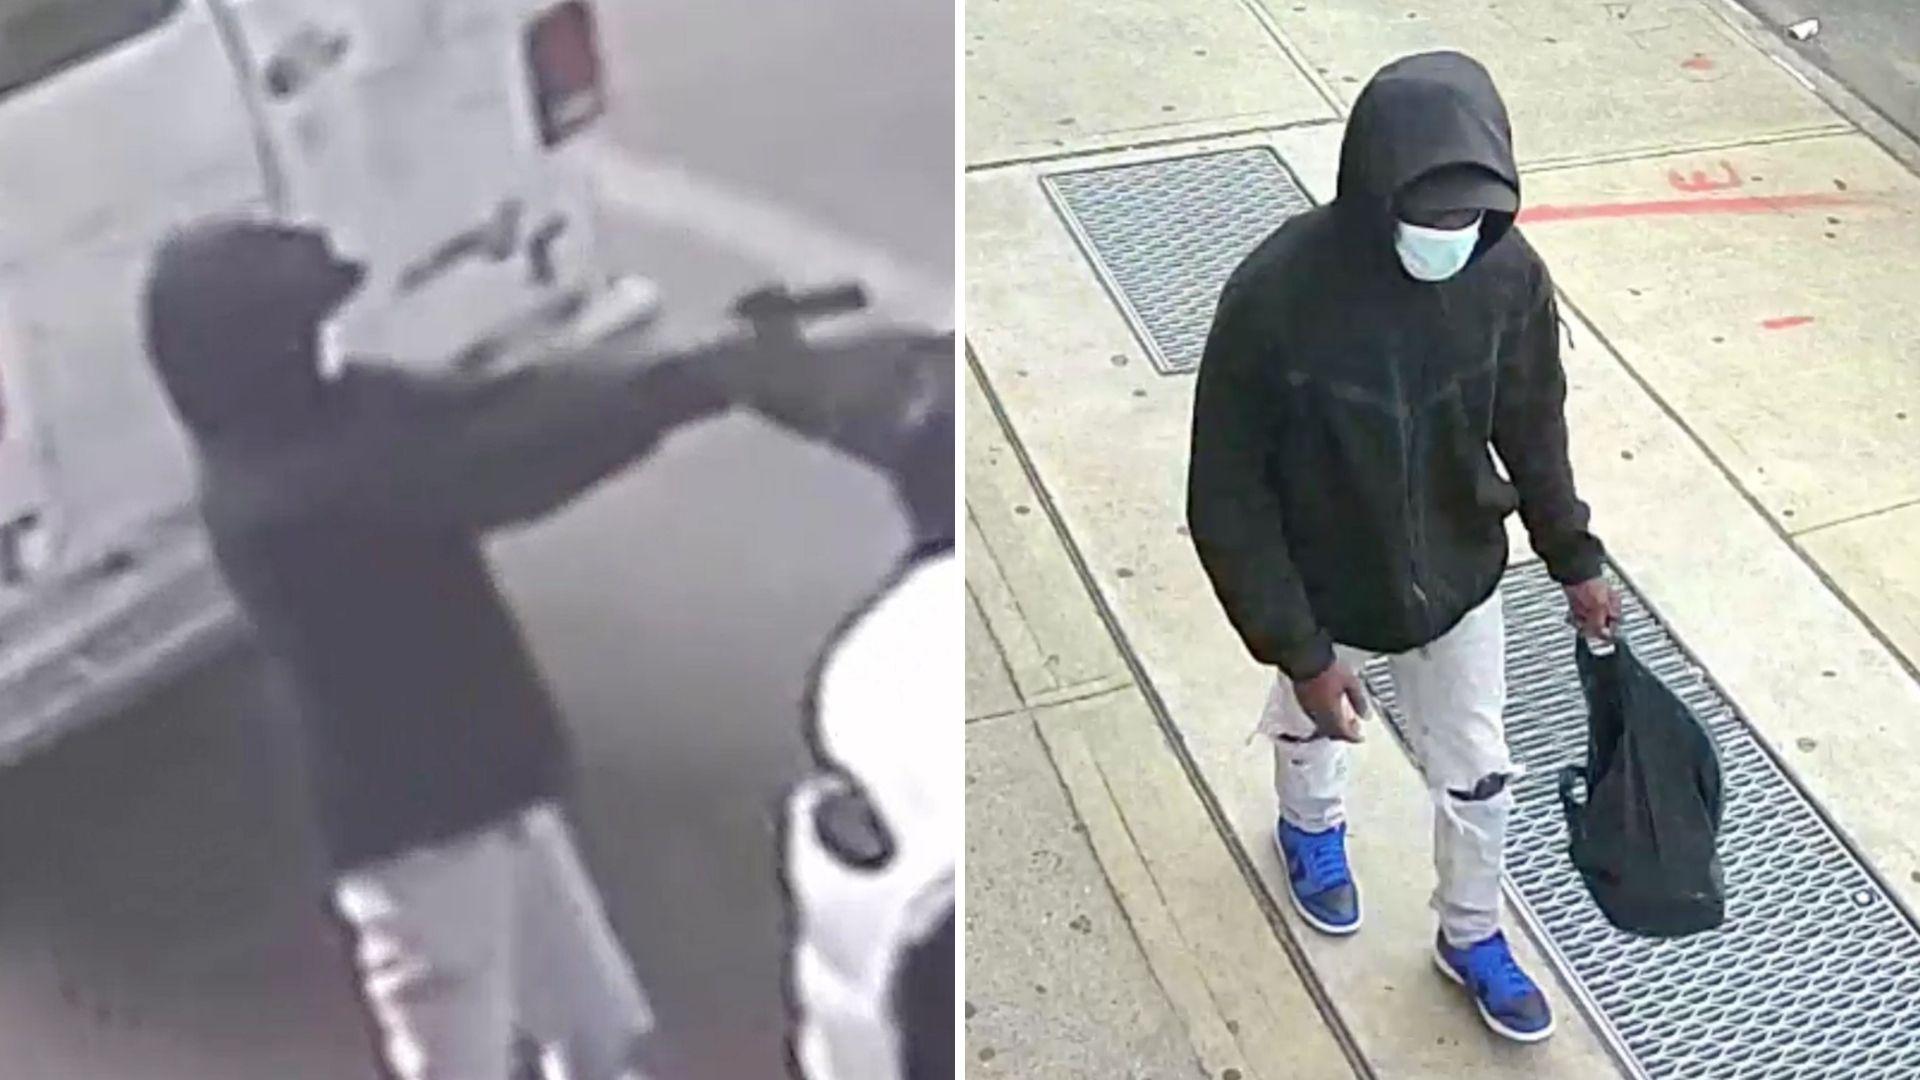 Suspected gunman in fatal shooting of 19-year-old in Brooklyn